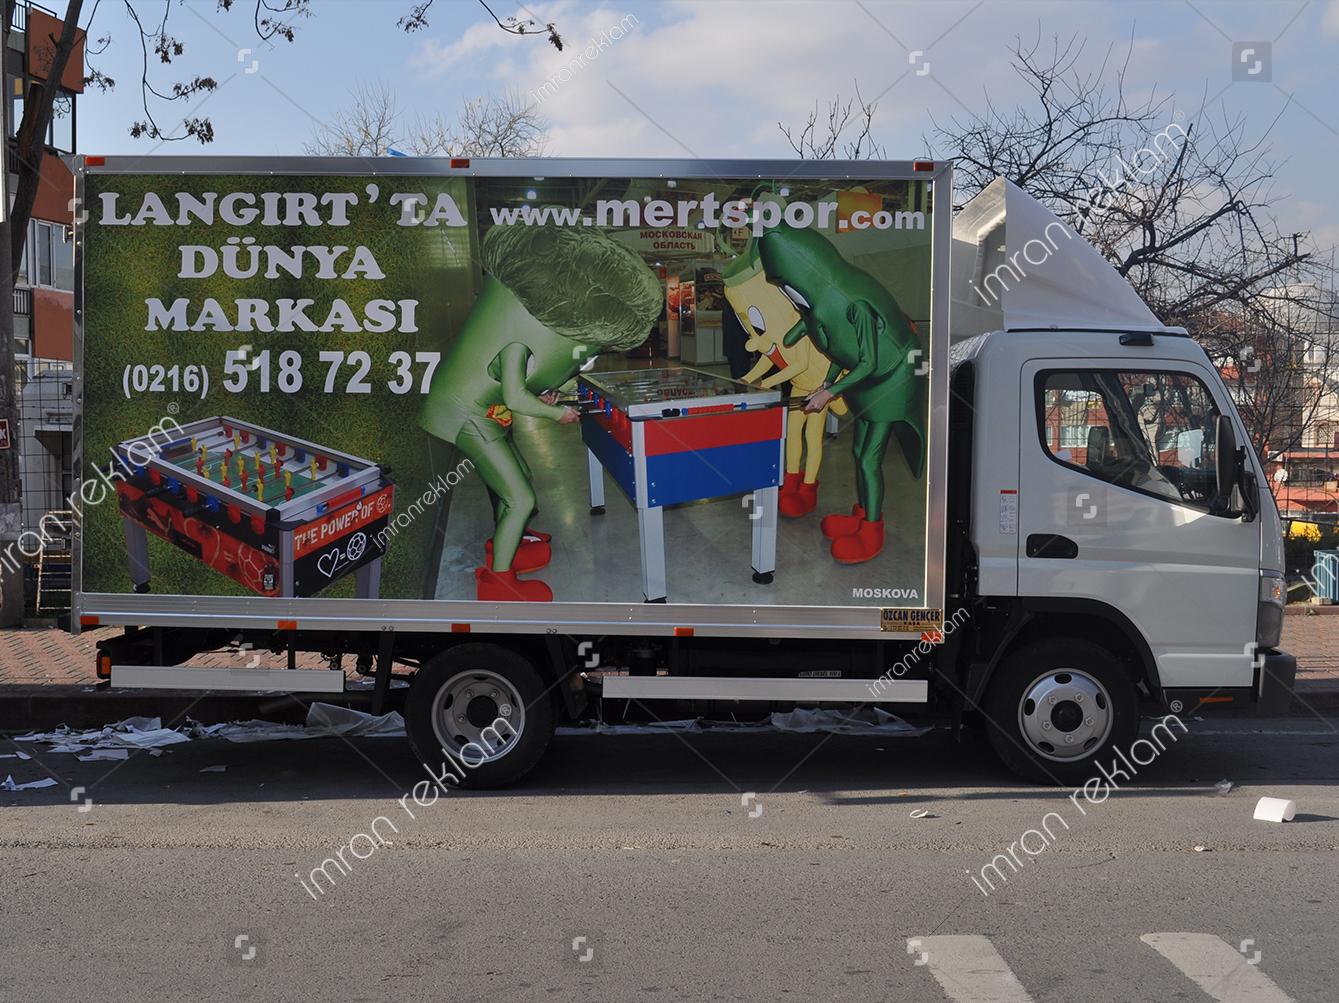 kamyonet-uzerine-reklam-giydirme